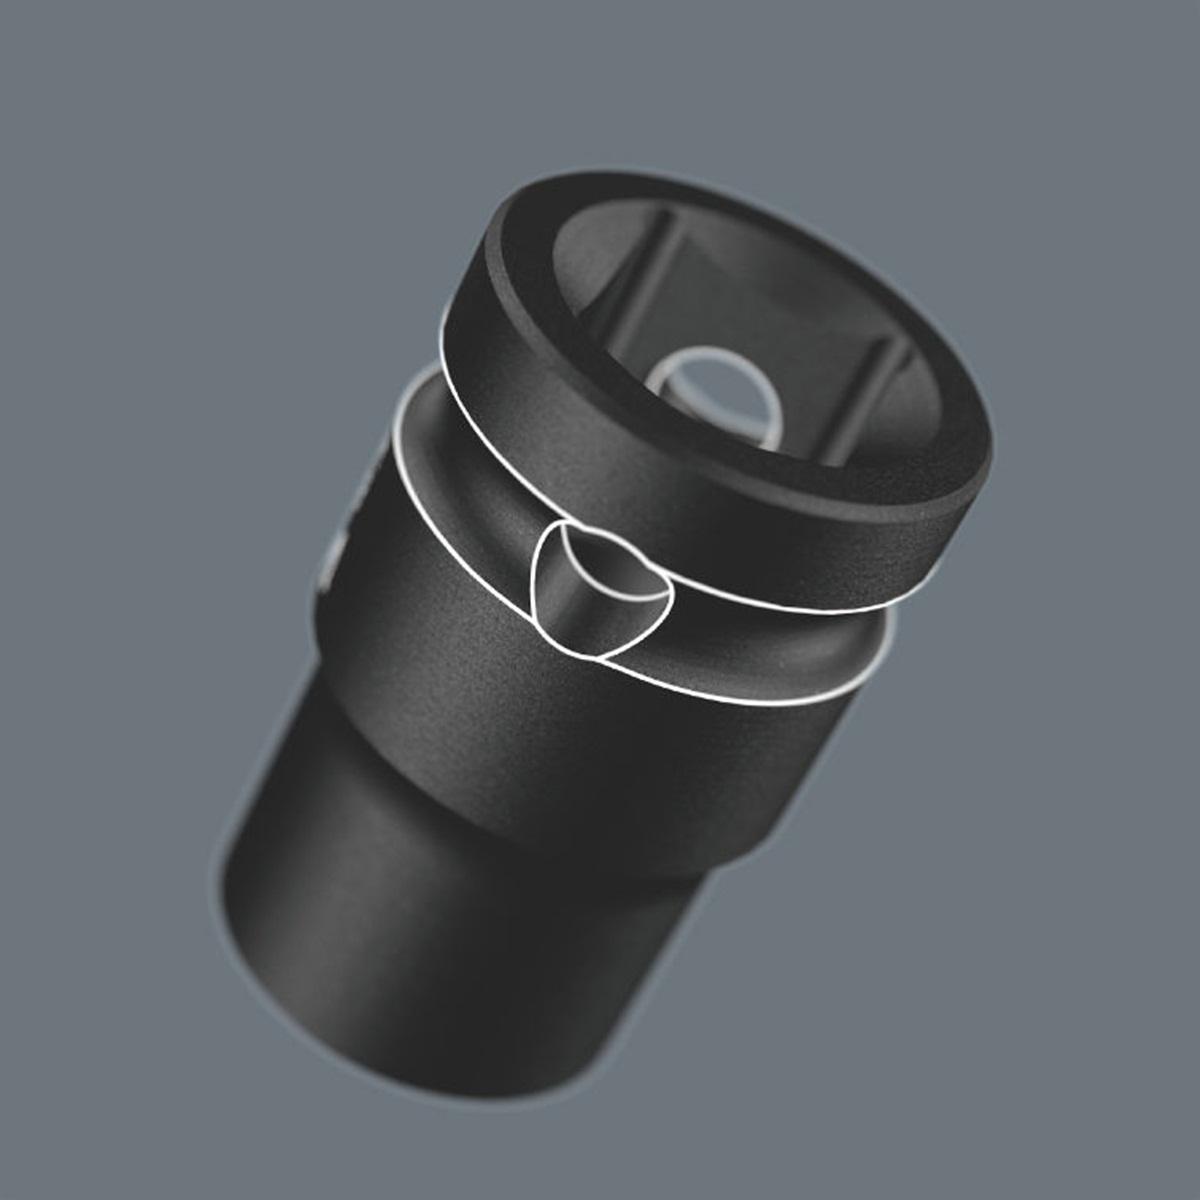 "Đầu tuýp 14mm Impaktor 8790 C Impaktor socket with 1/2"" drive Wera 05004571001"